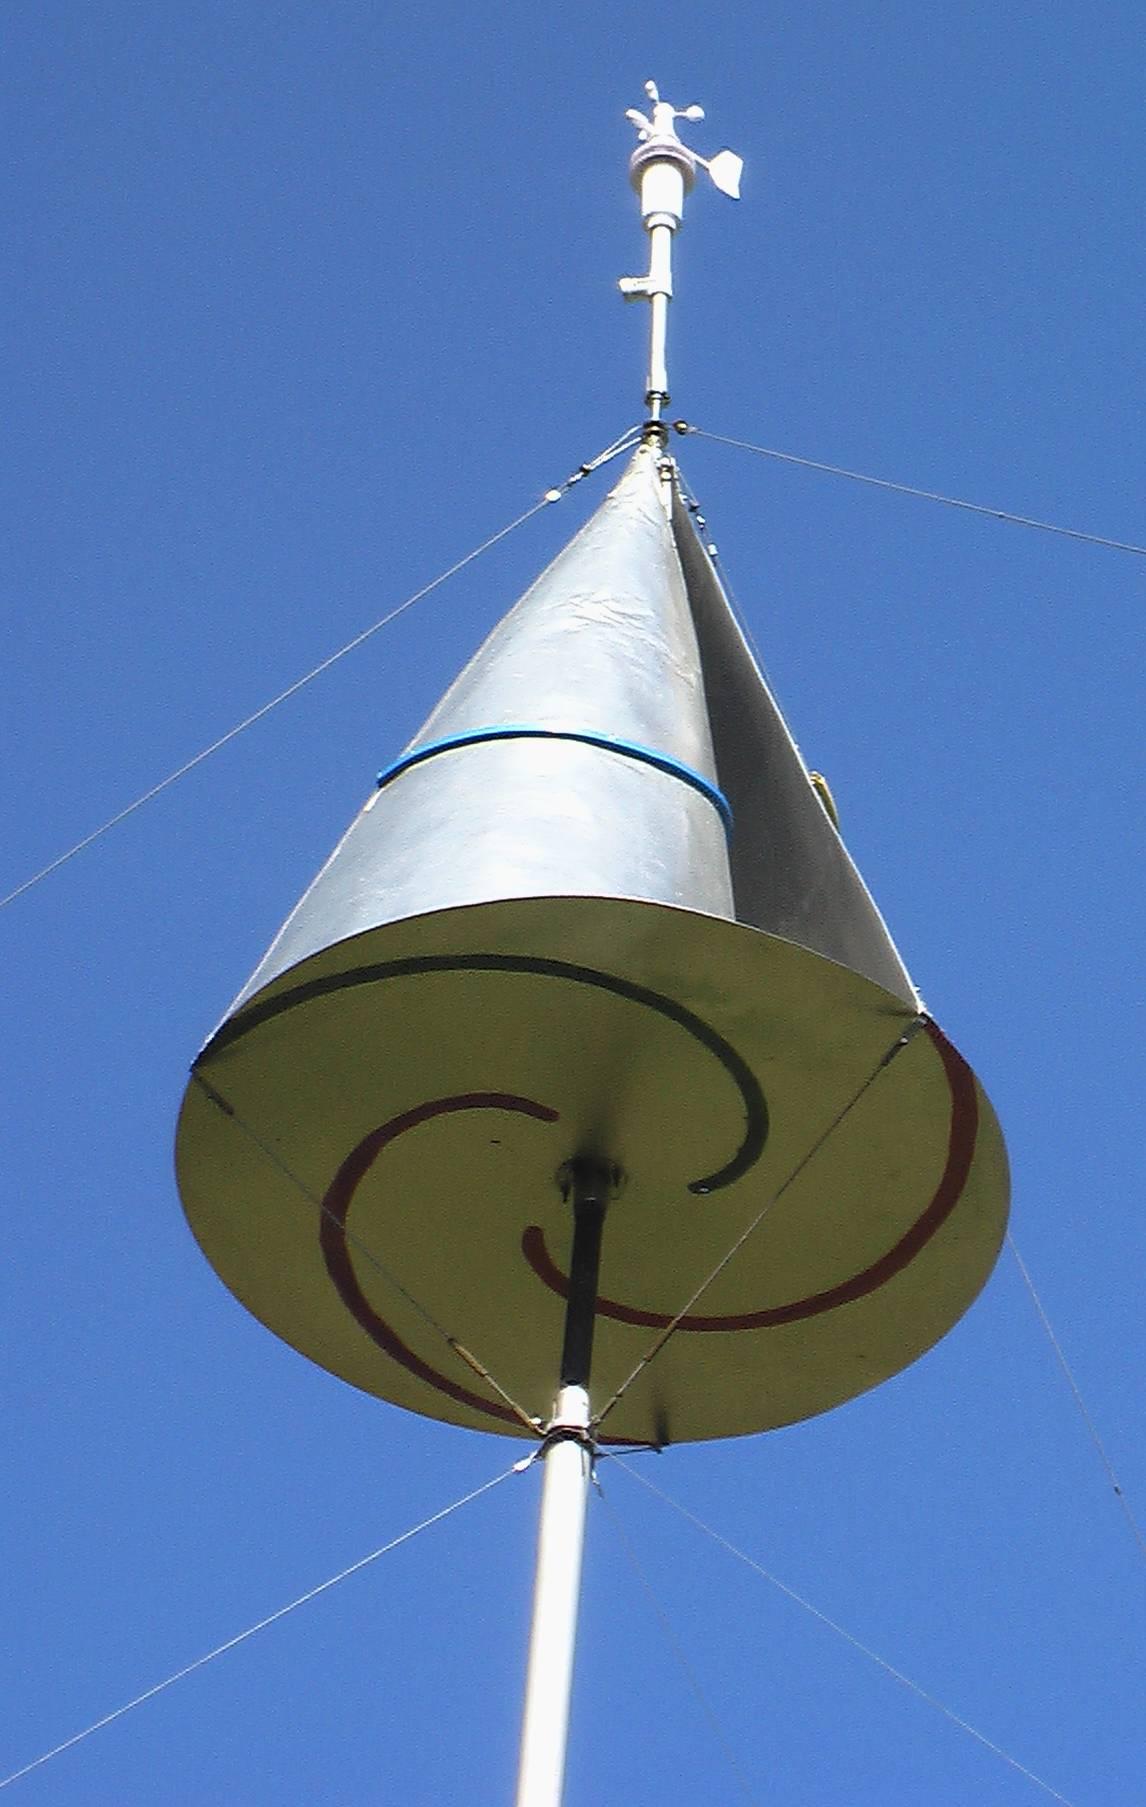 Homemade Vertical Wind Generator Wind power